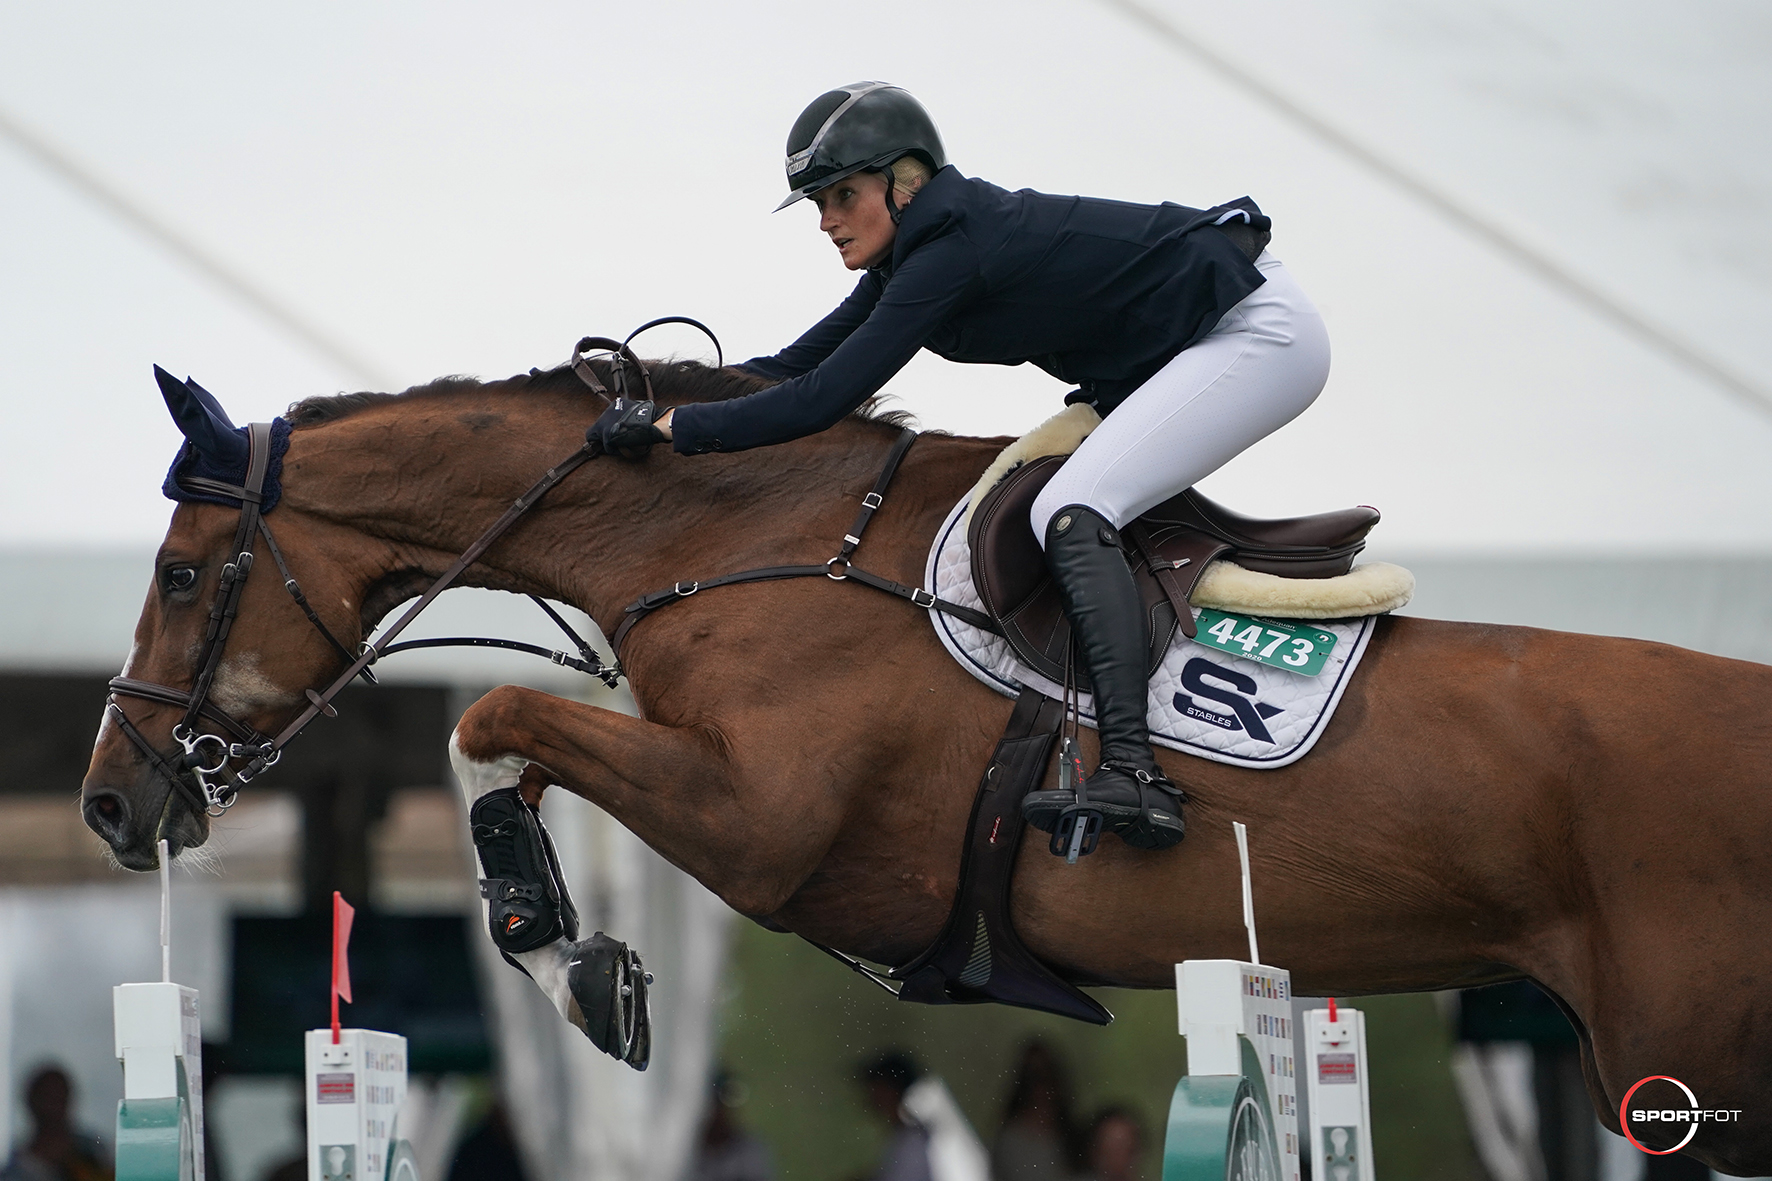 Petronella Andersson and Davarusa by Sportfot 528_2011